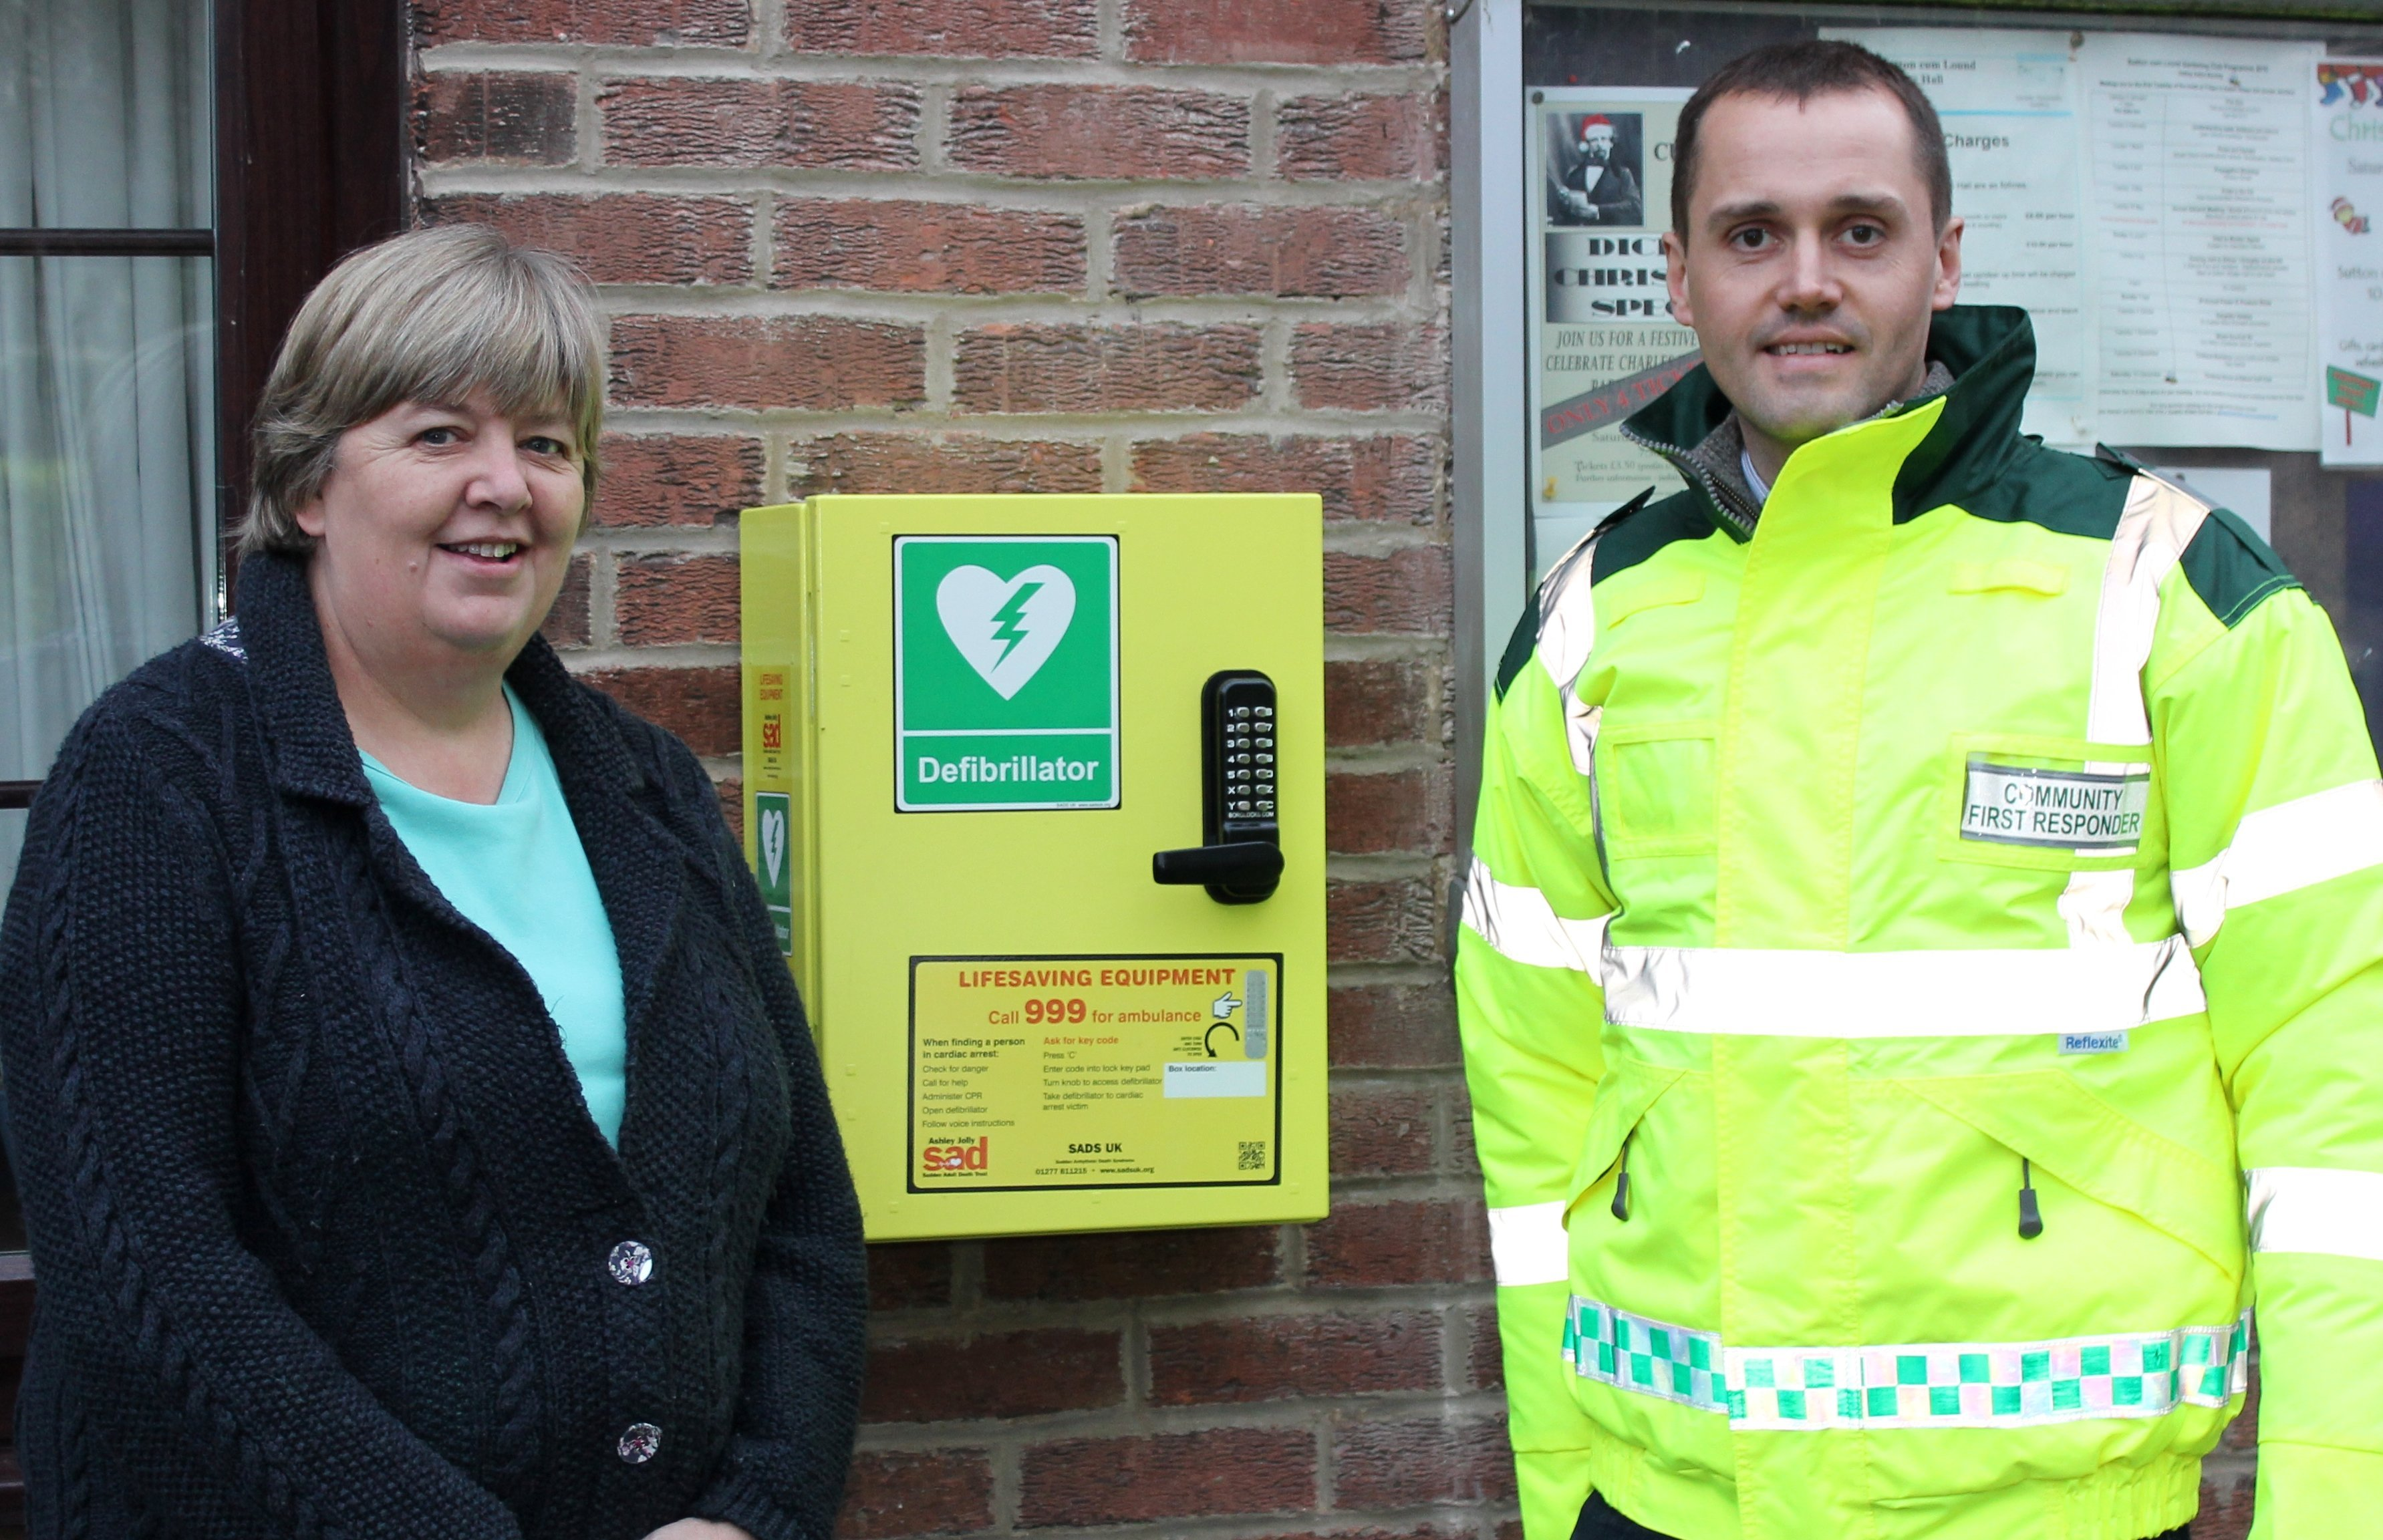 Mattersey Defibrillator